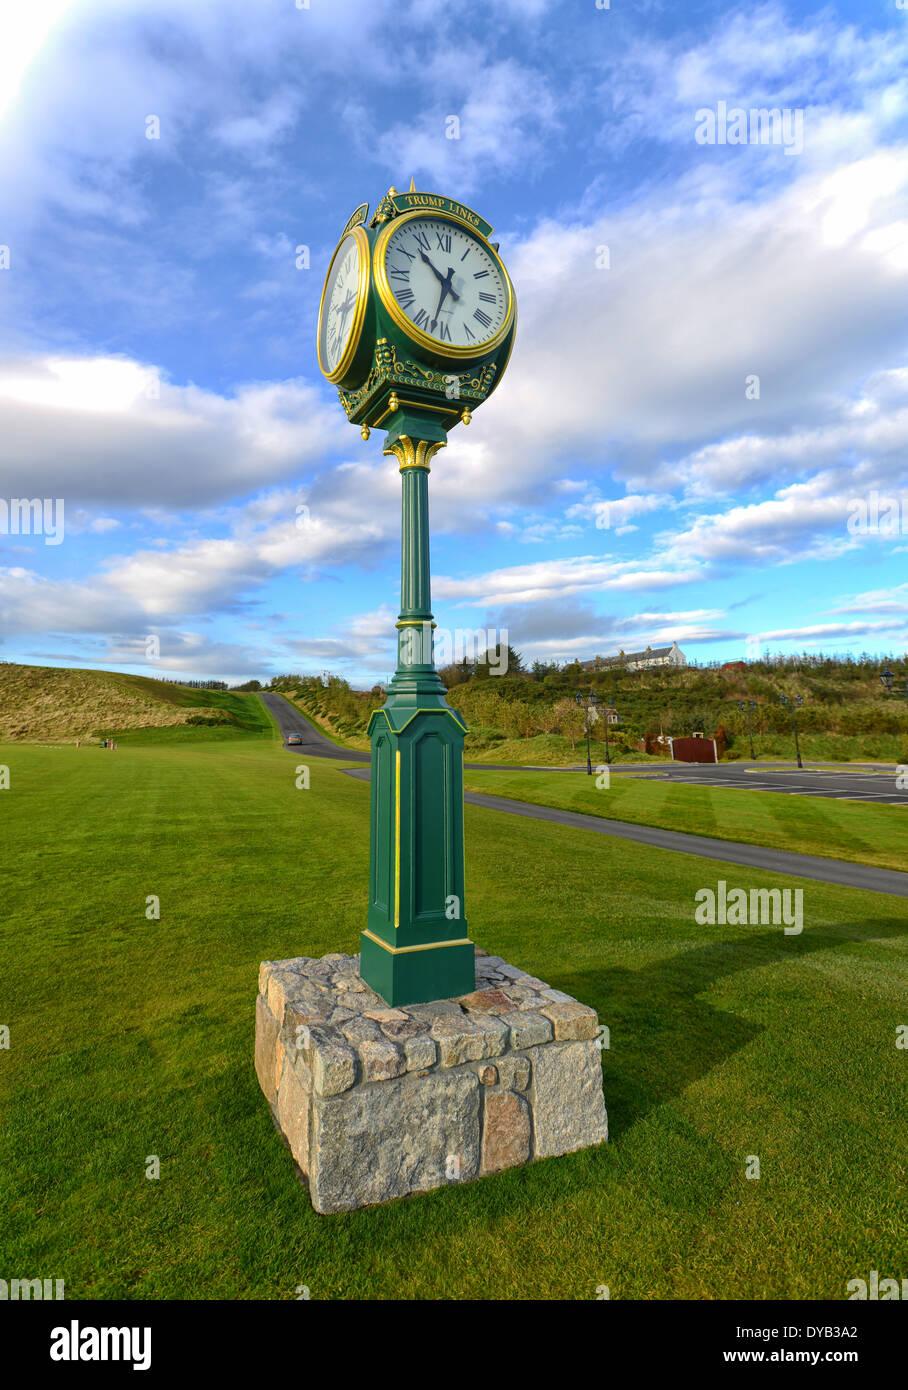 Image of Clock at Trump International Golf Links in Aberdeen, Scotland - Stock Image